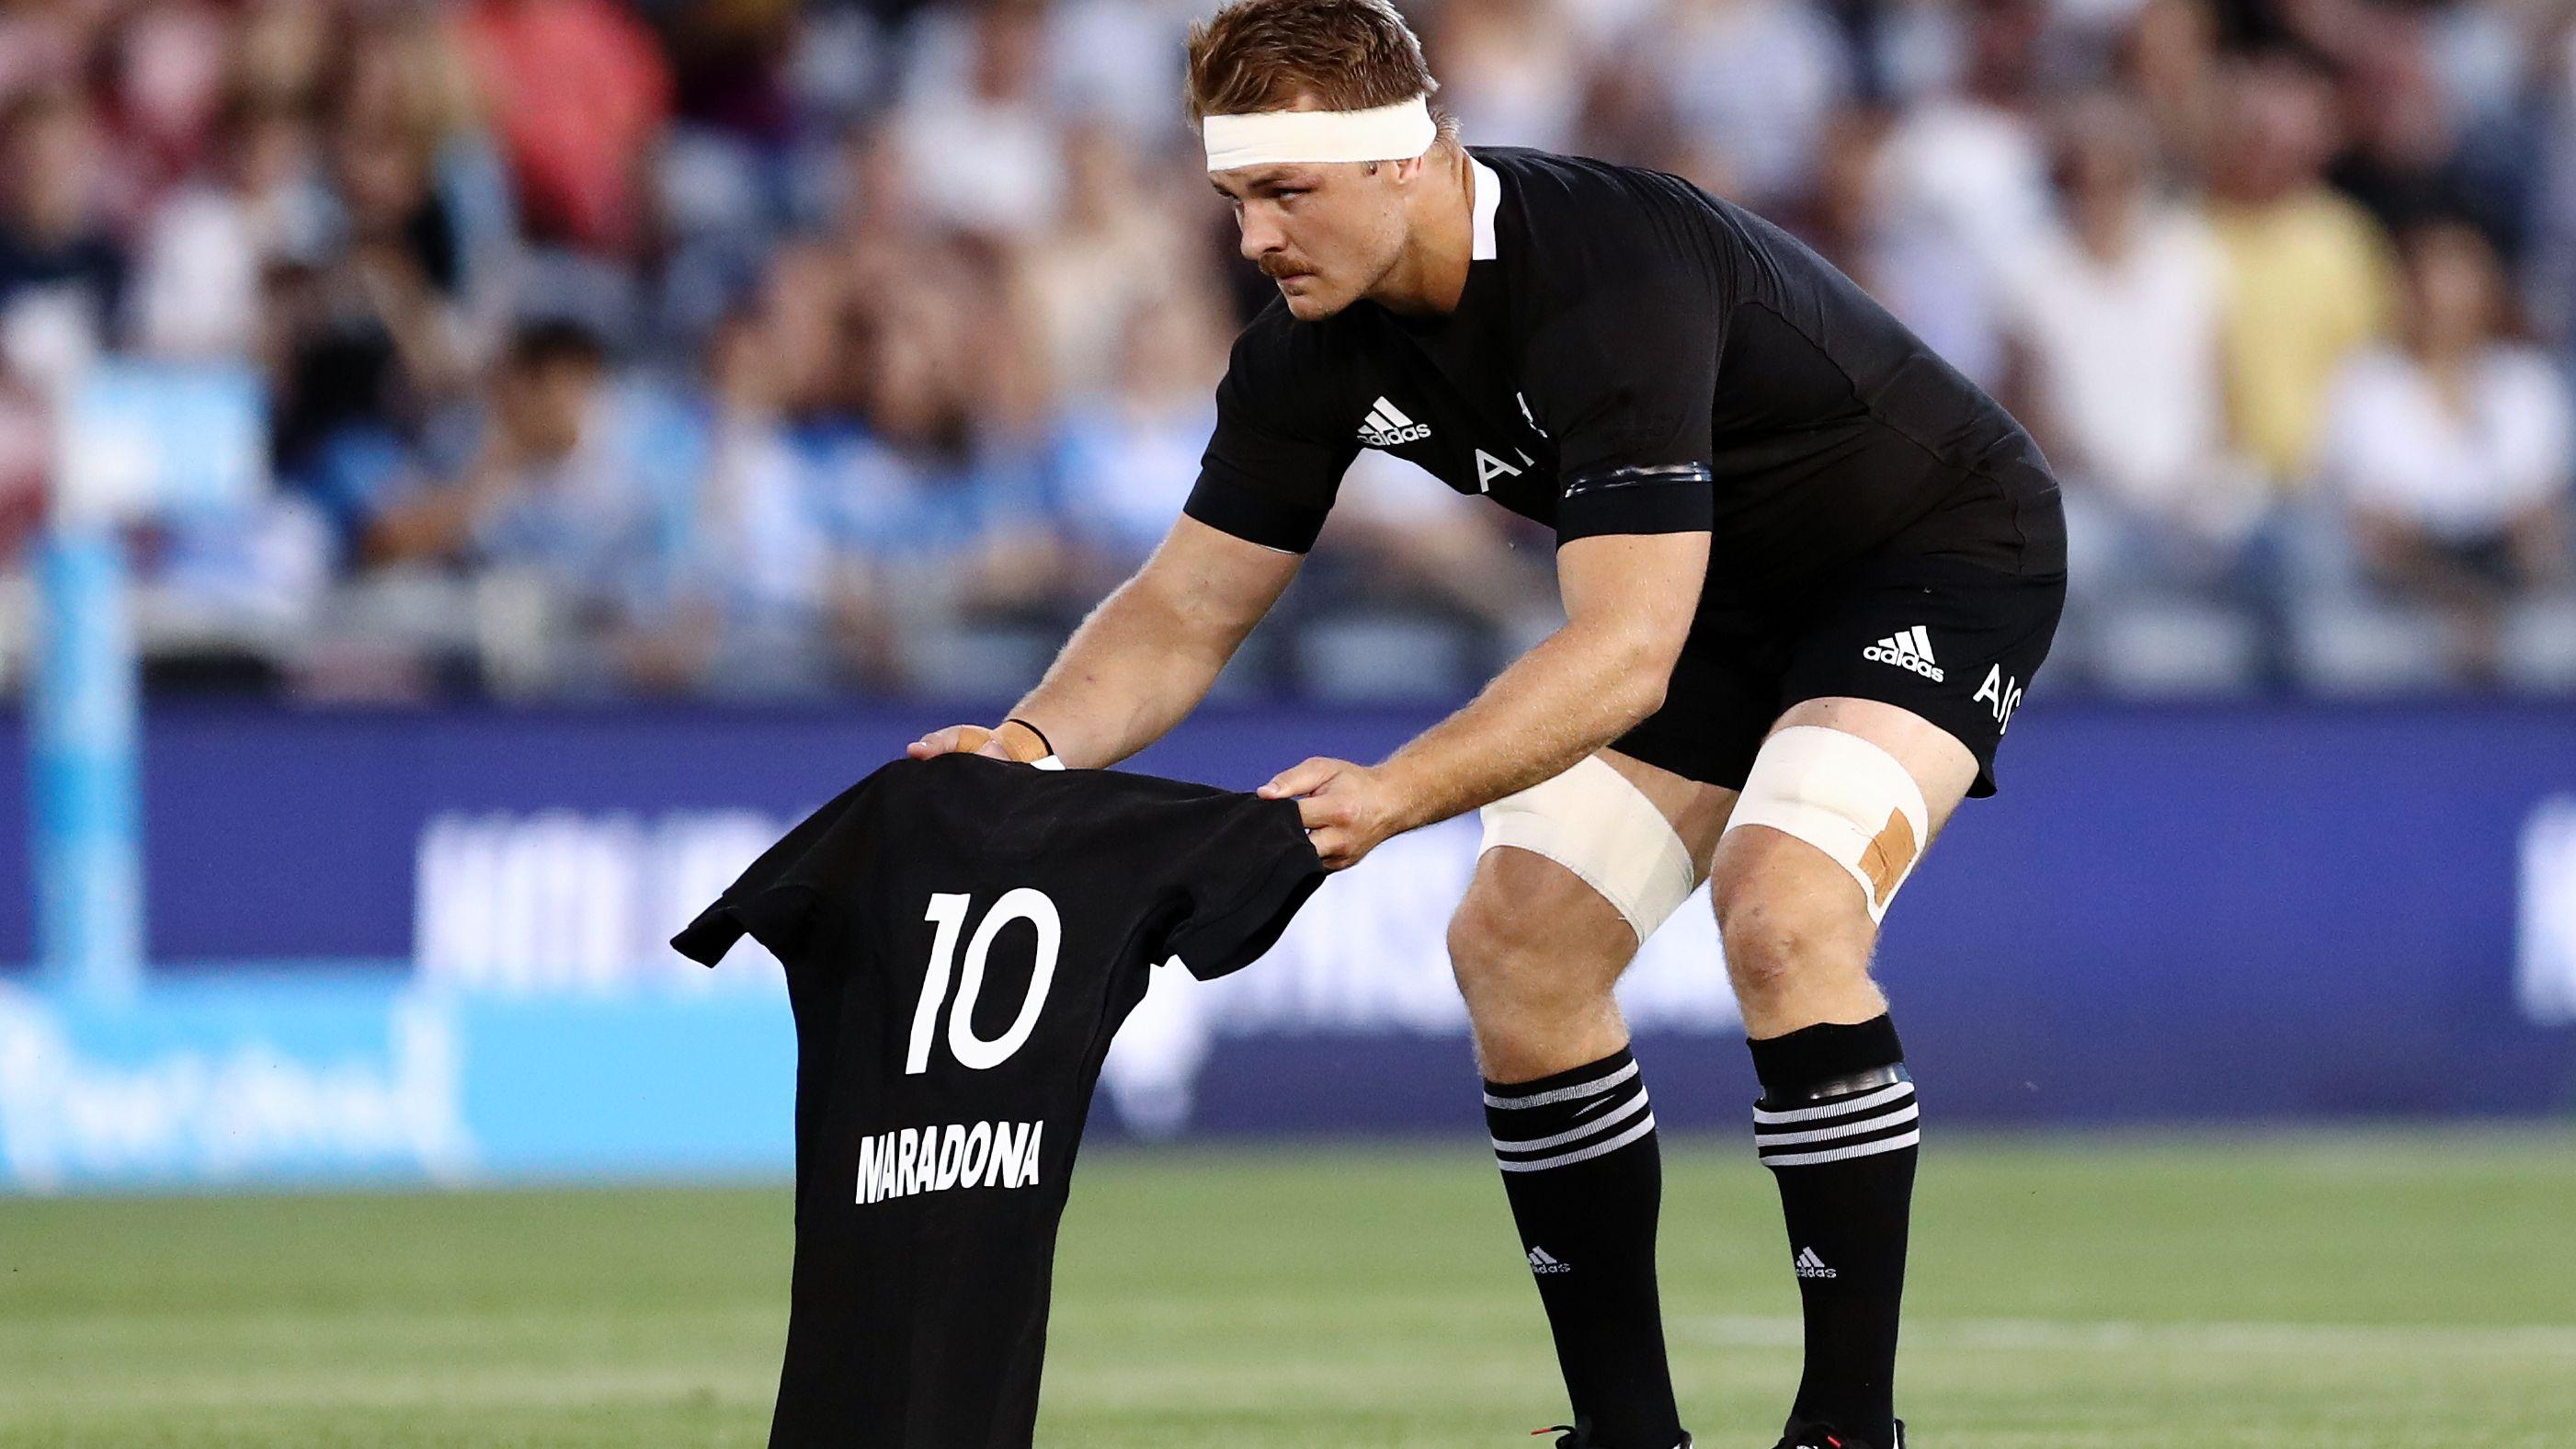 All Blacks honour Diego Maradona with classy pre-game jersey tribute